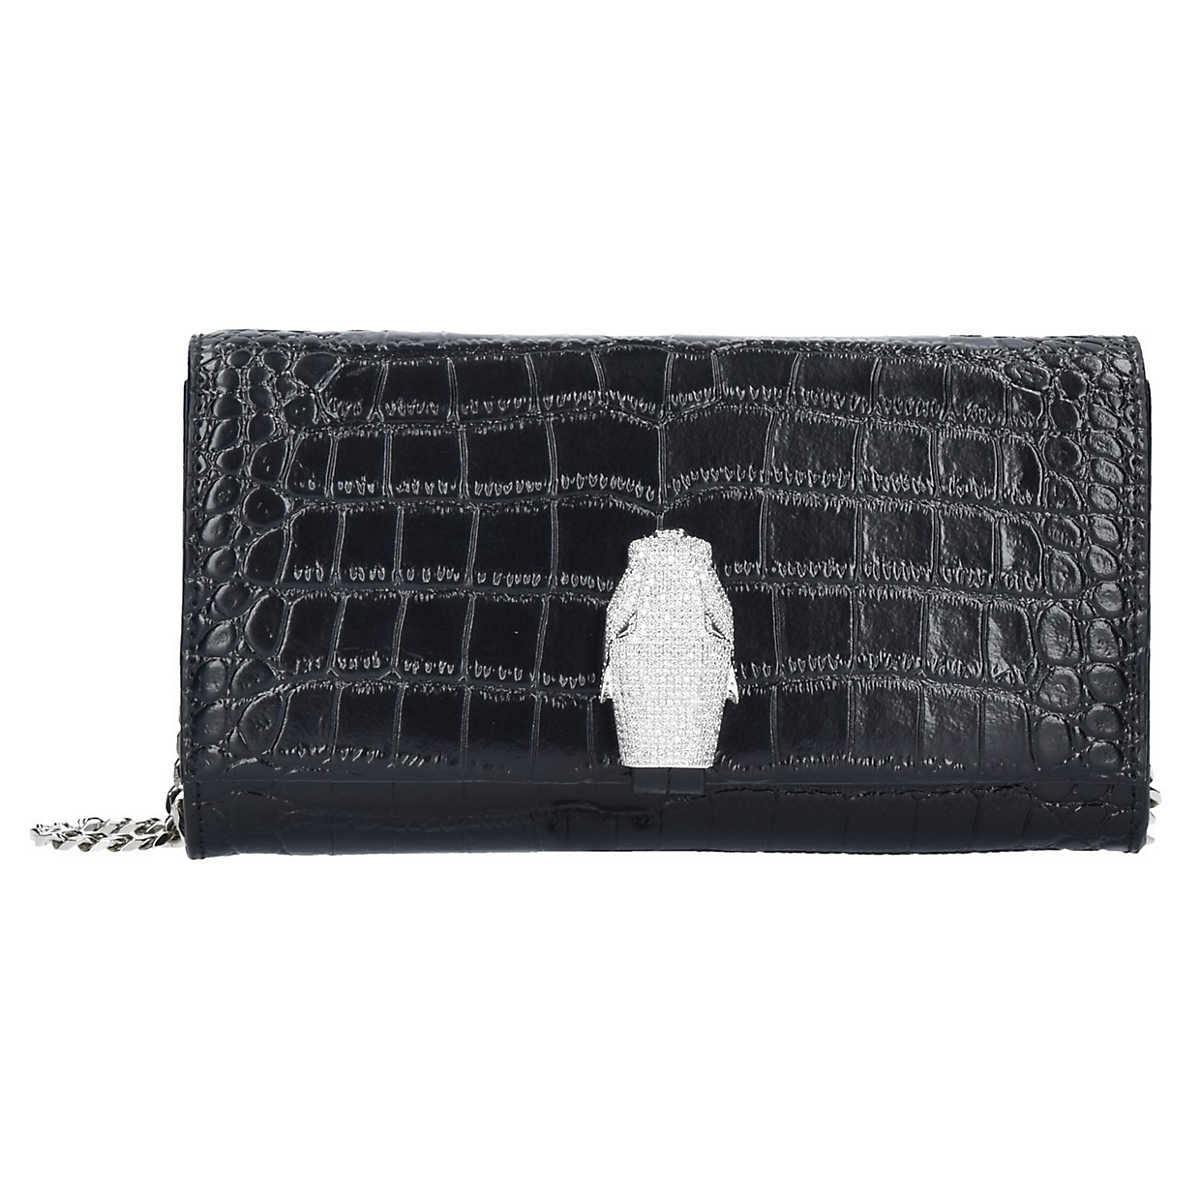 Roberto Cavalli Class RSVP Treasure Clutch Umh�¤ngetasche Leder 27 cm schwarz - Roberto Cavalli Class - Clutch & Abendtaschen - Taschen - mirapodo.de